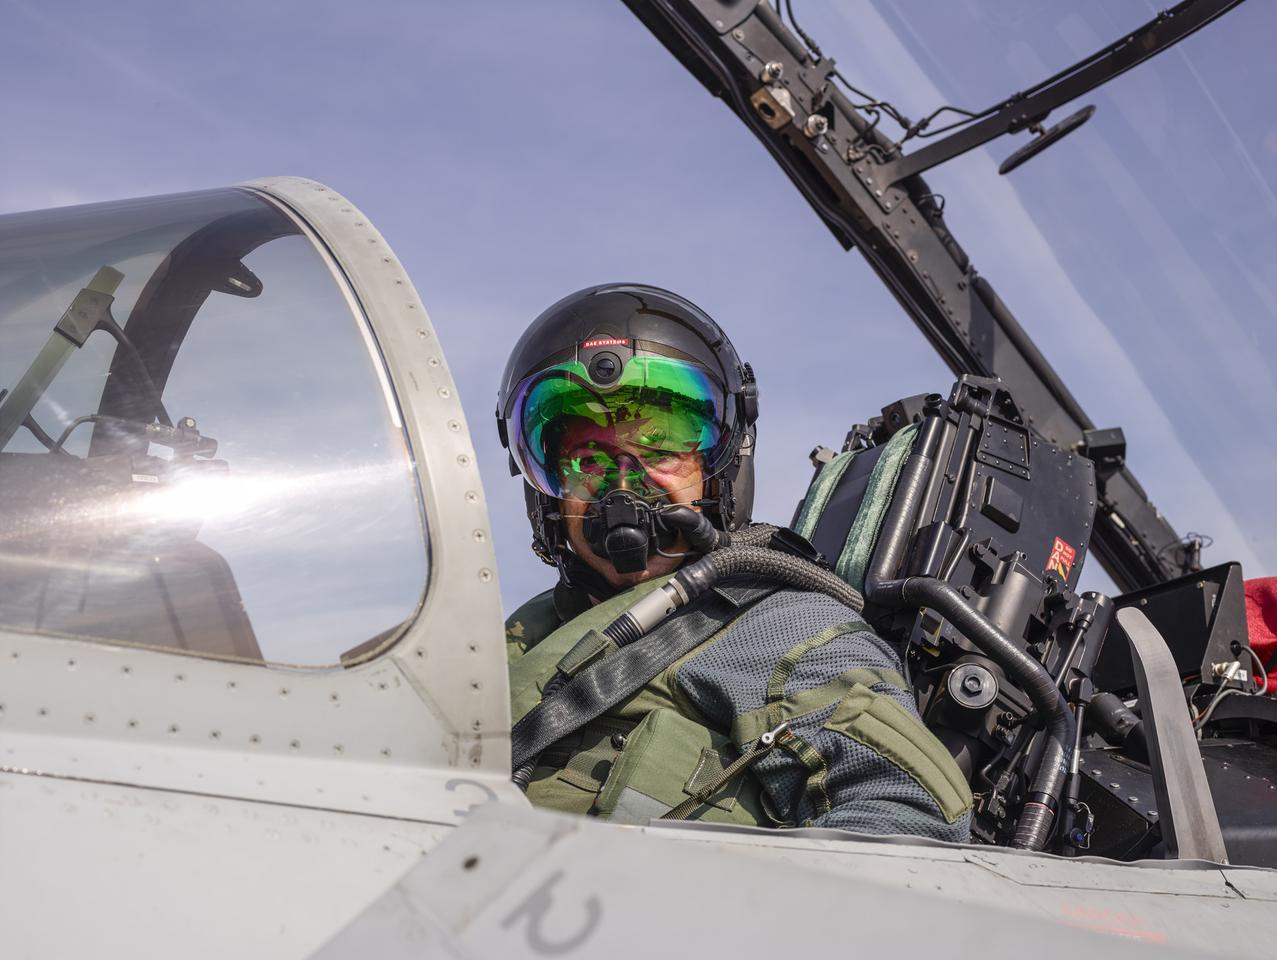 BAE Systems announces Striker II HMD for combat pilots